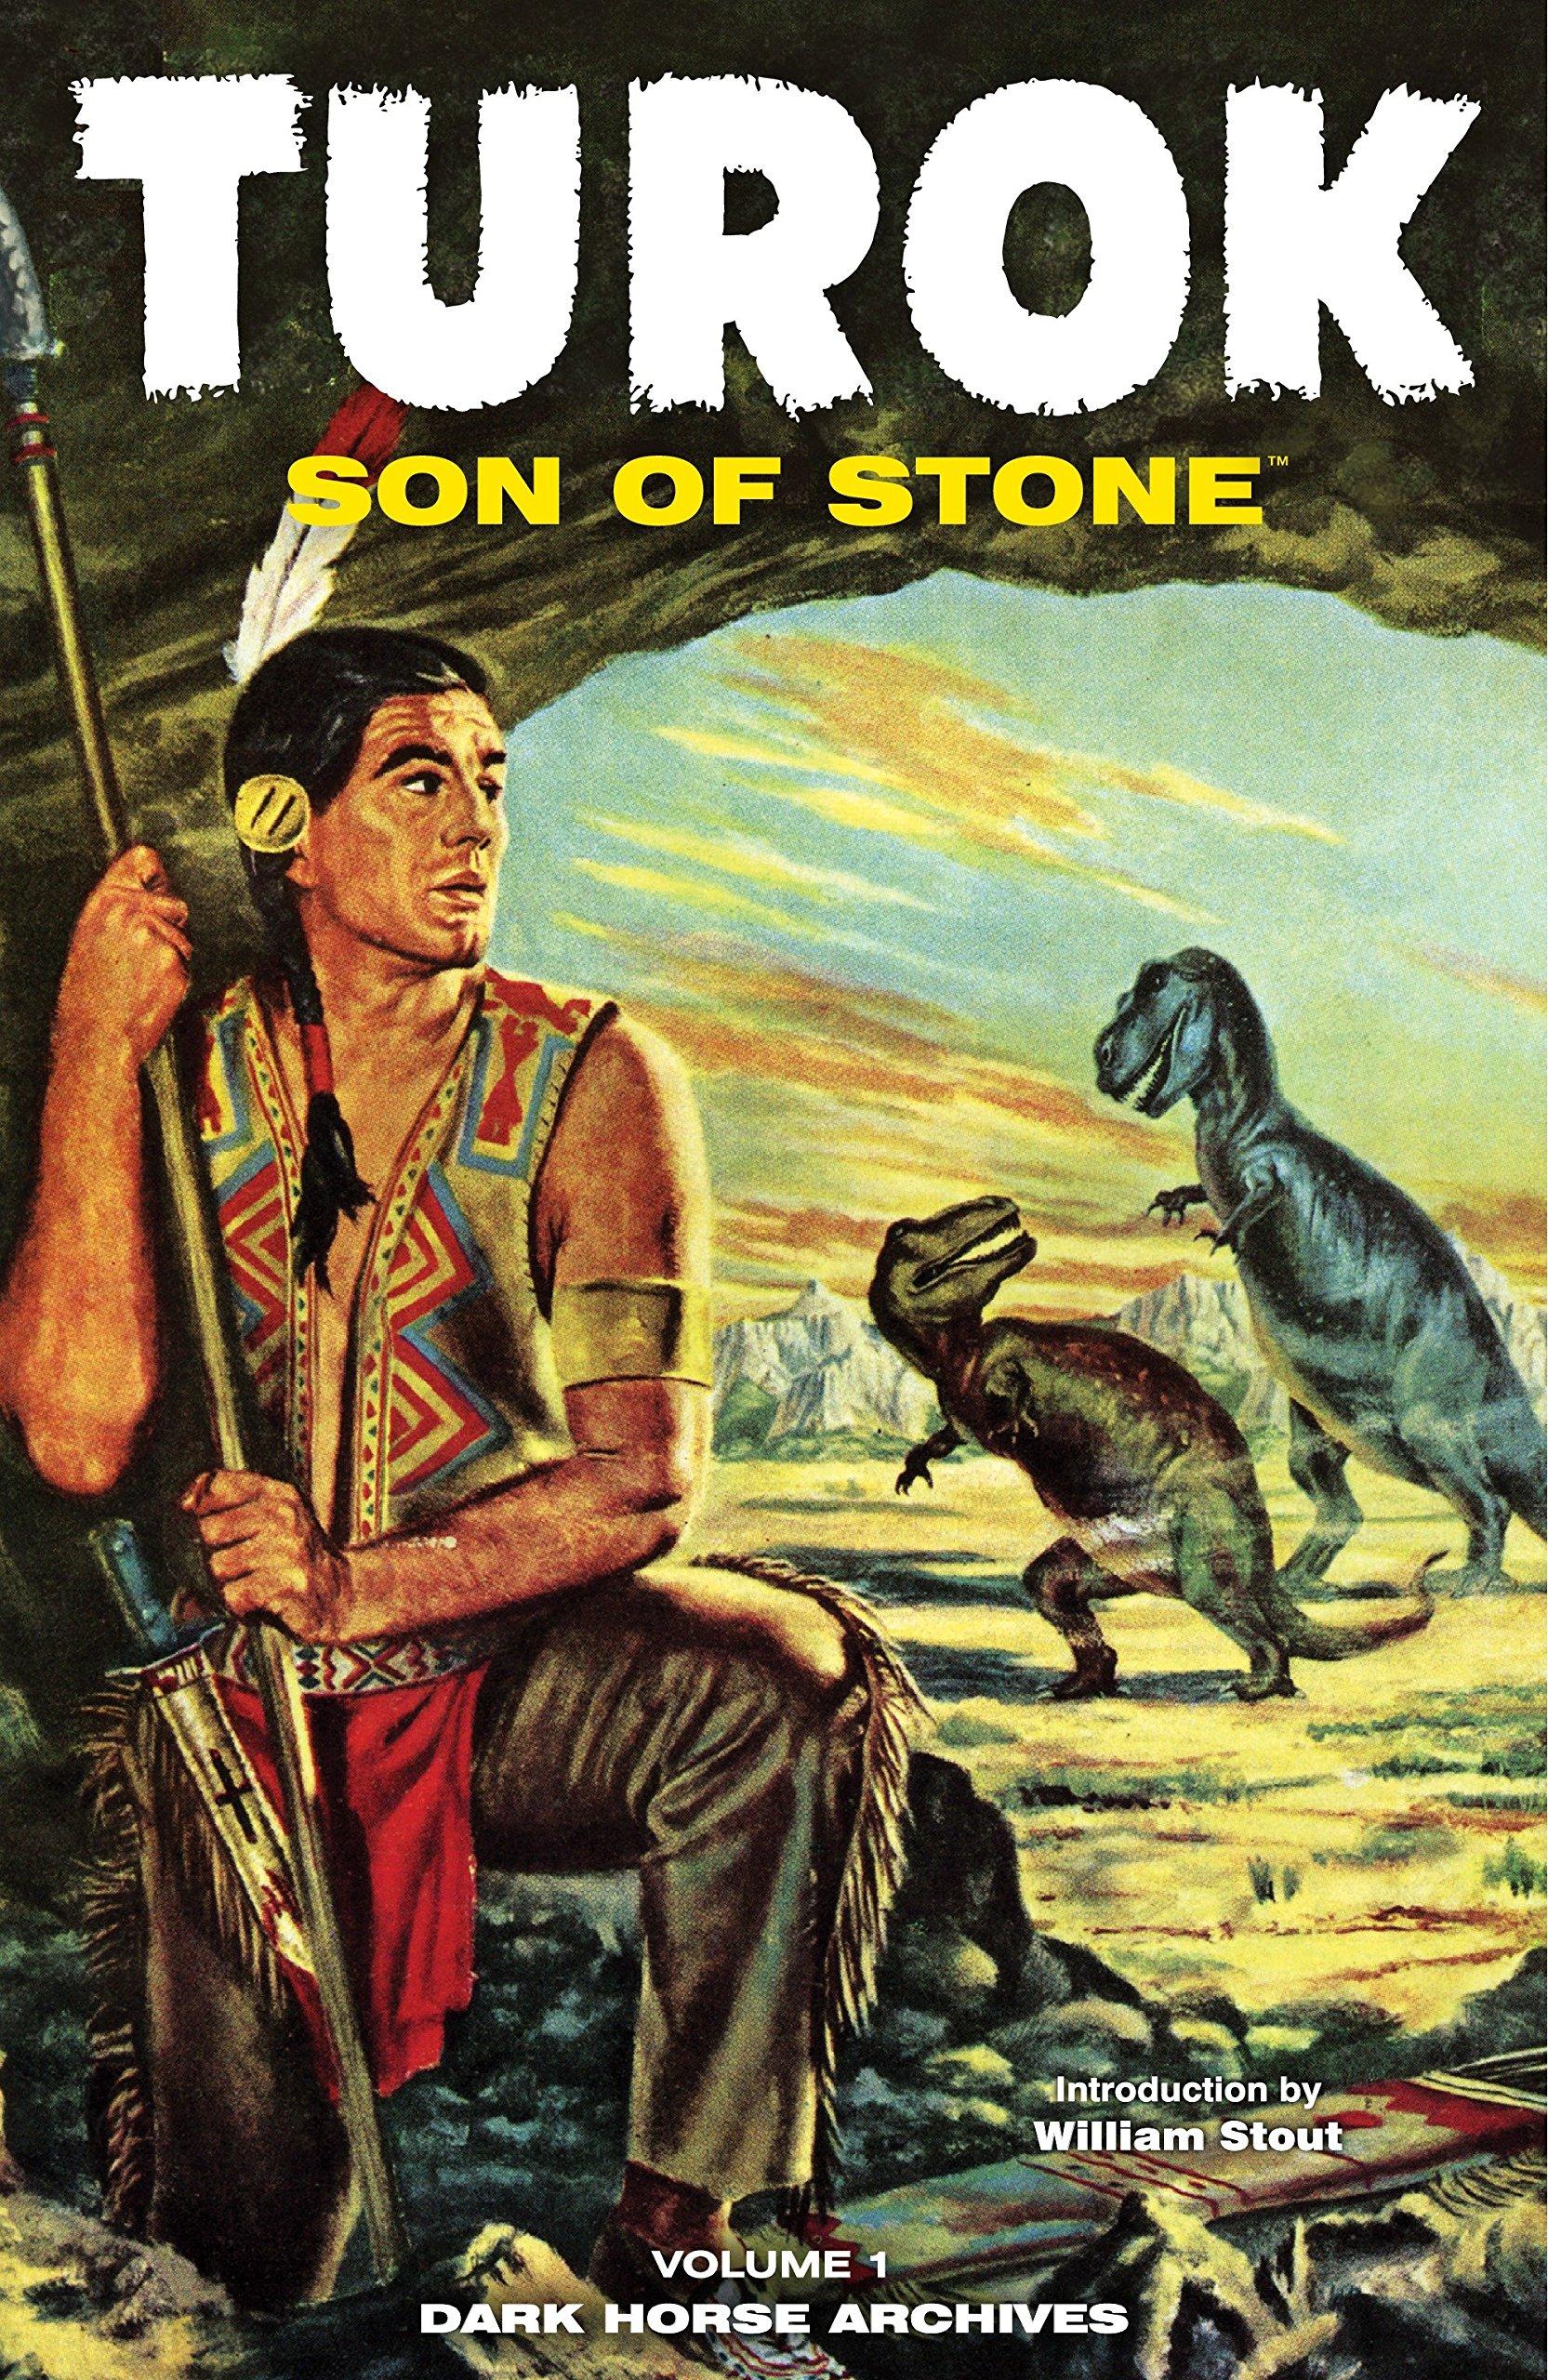 Turok Son Of Stone Archives Volume 1 Alberto Giolitti Matthew H Murphy Mark Evanier William Stout 9781595821553 Amazon Com Books